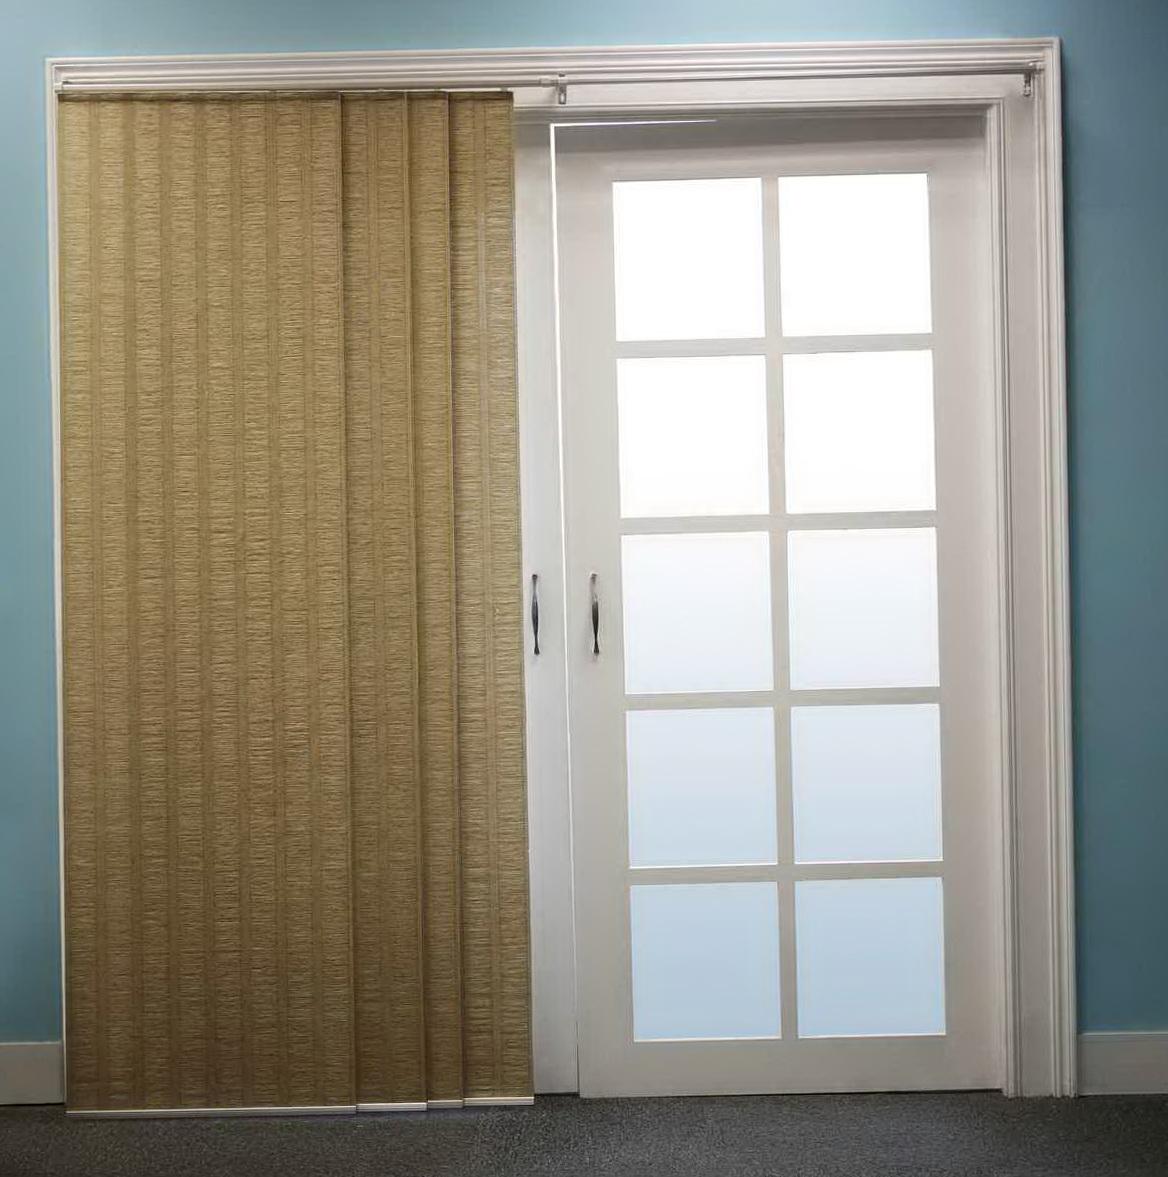 Patio door curtain rods home design ideas for Door curtains